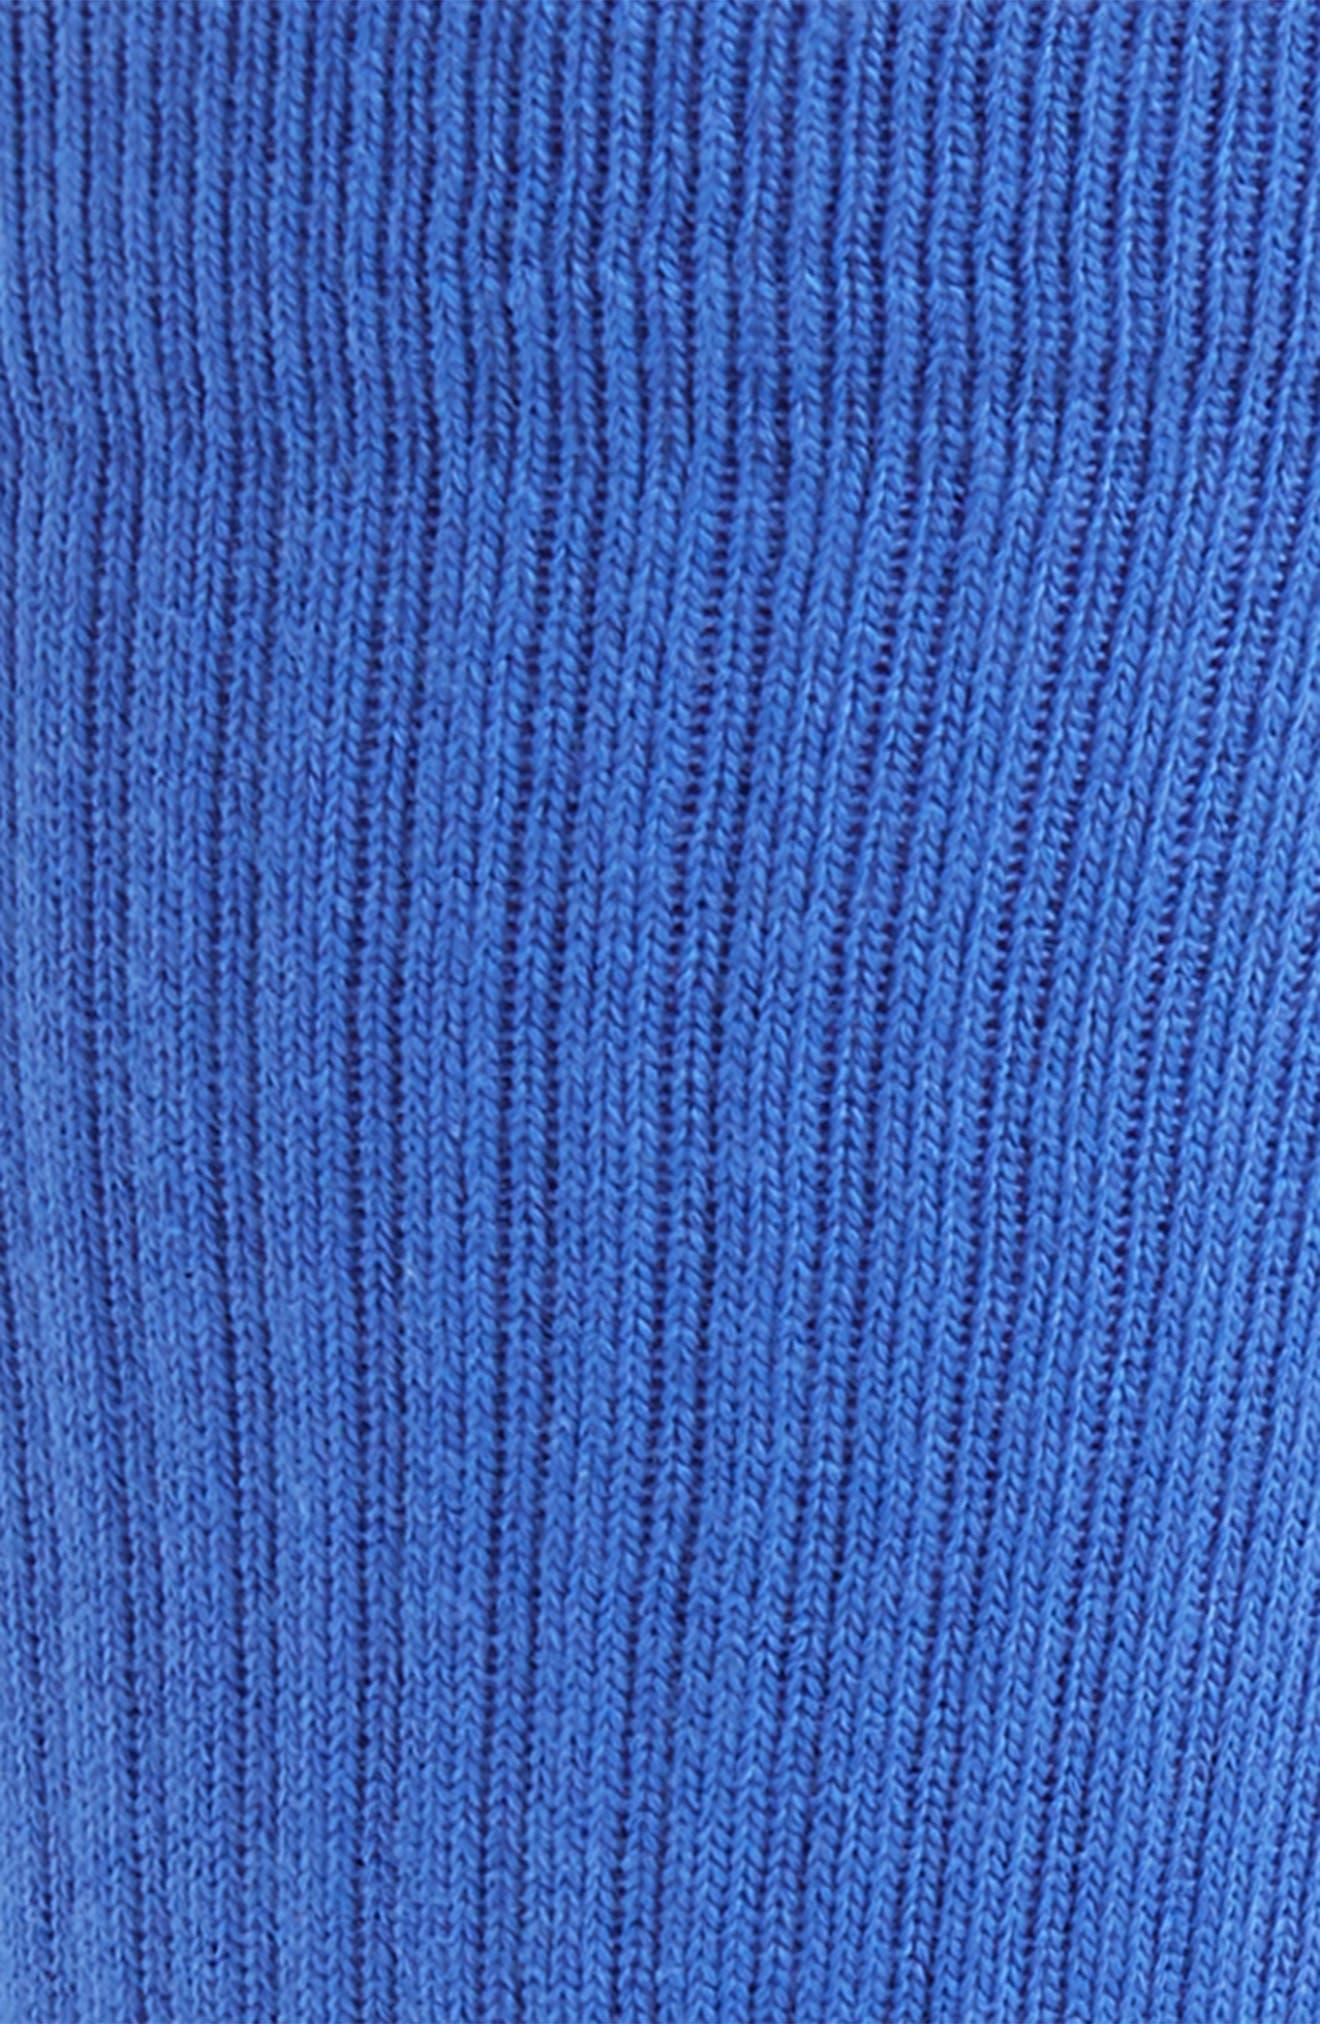 STANCE,                             'Icon' Athletic Socks,                             Alternate thumbnail 2, color,                             ROYAL